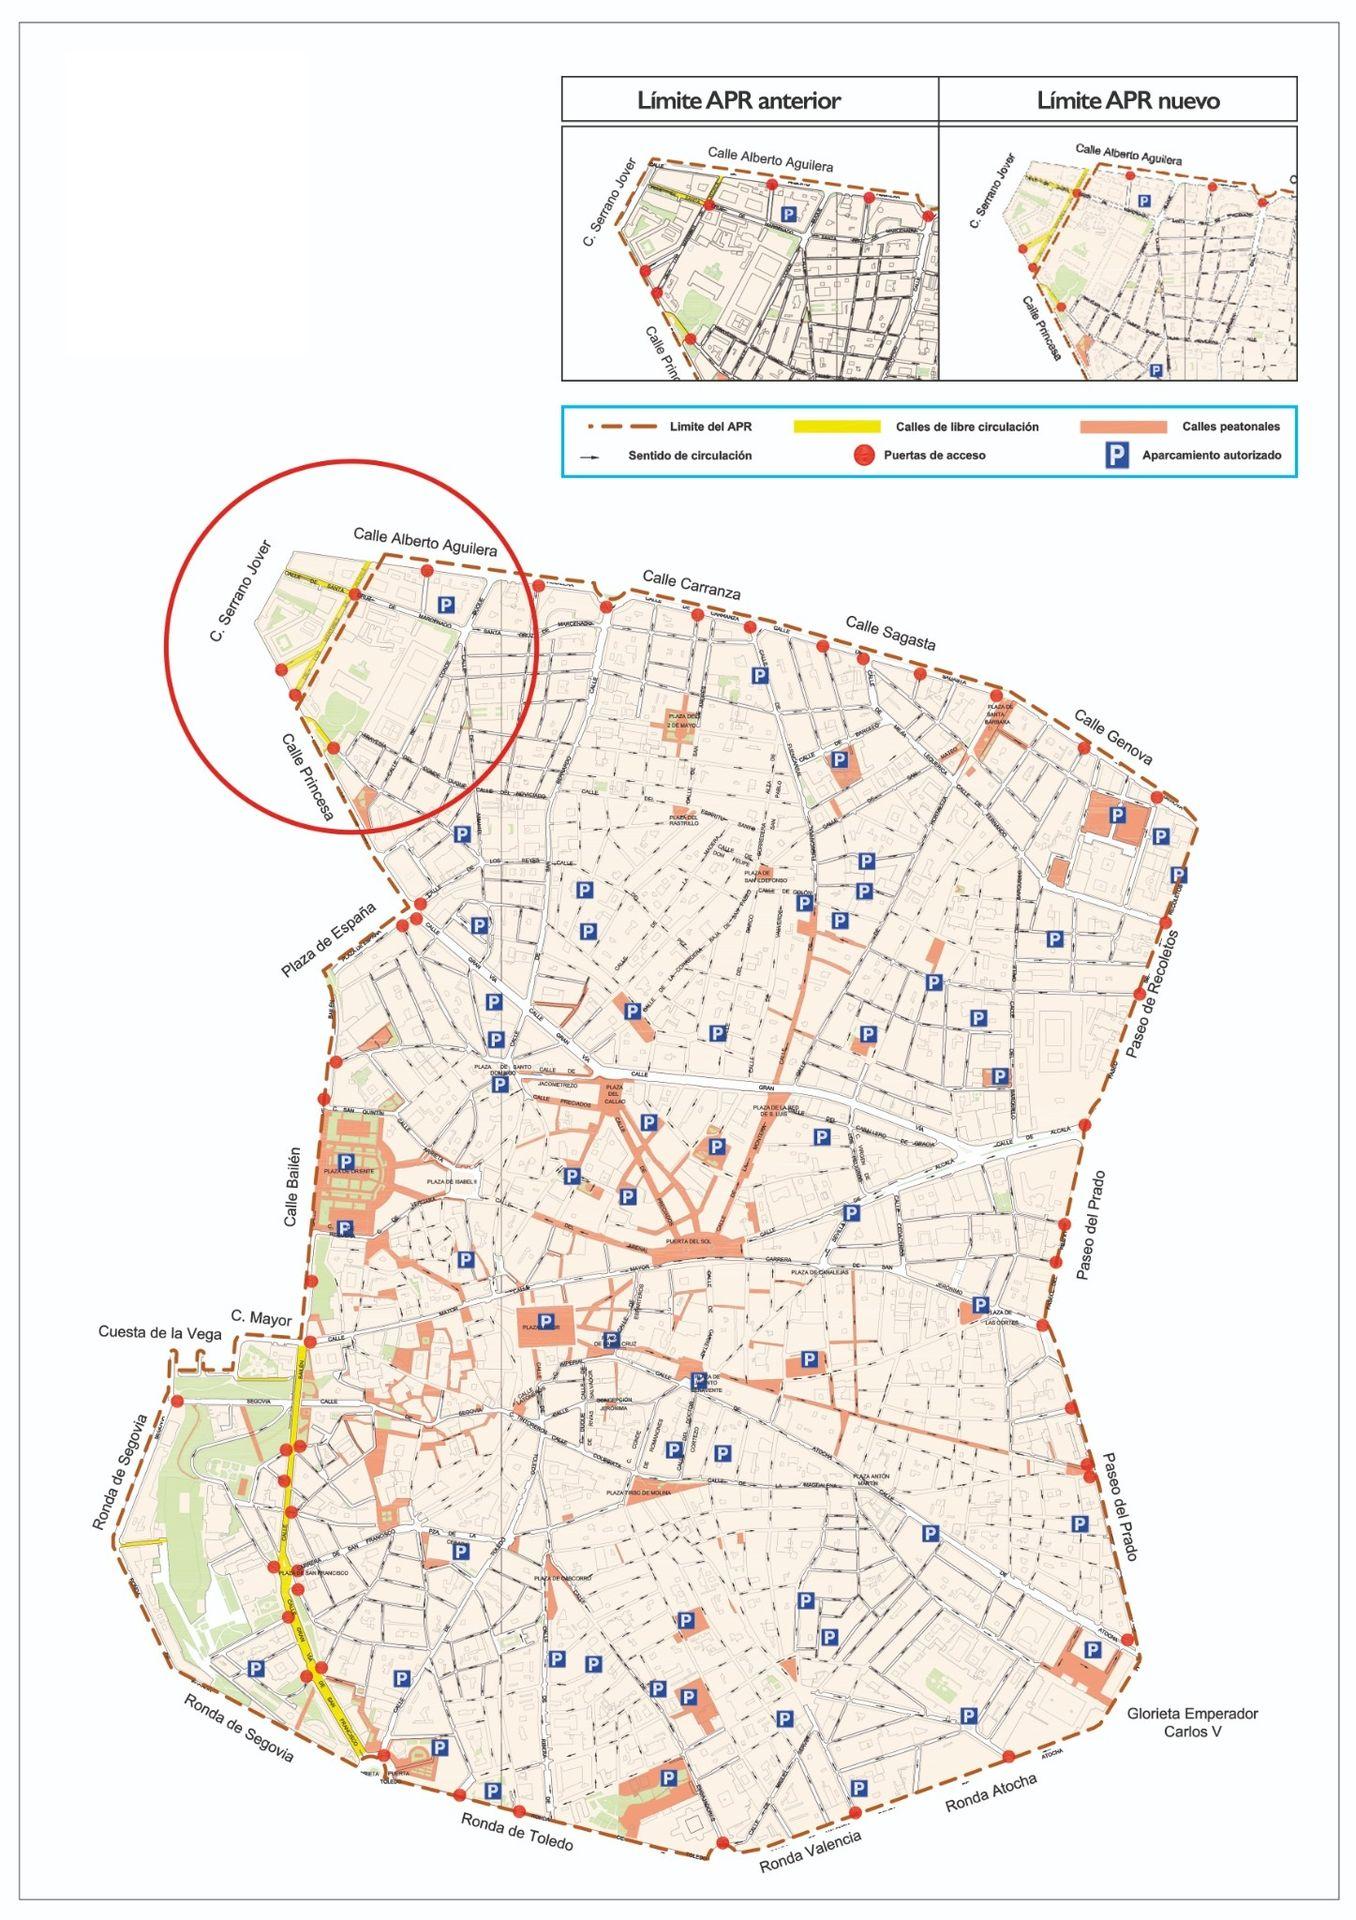 mapa-martires-de-alcala.jpg